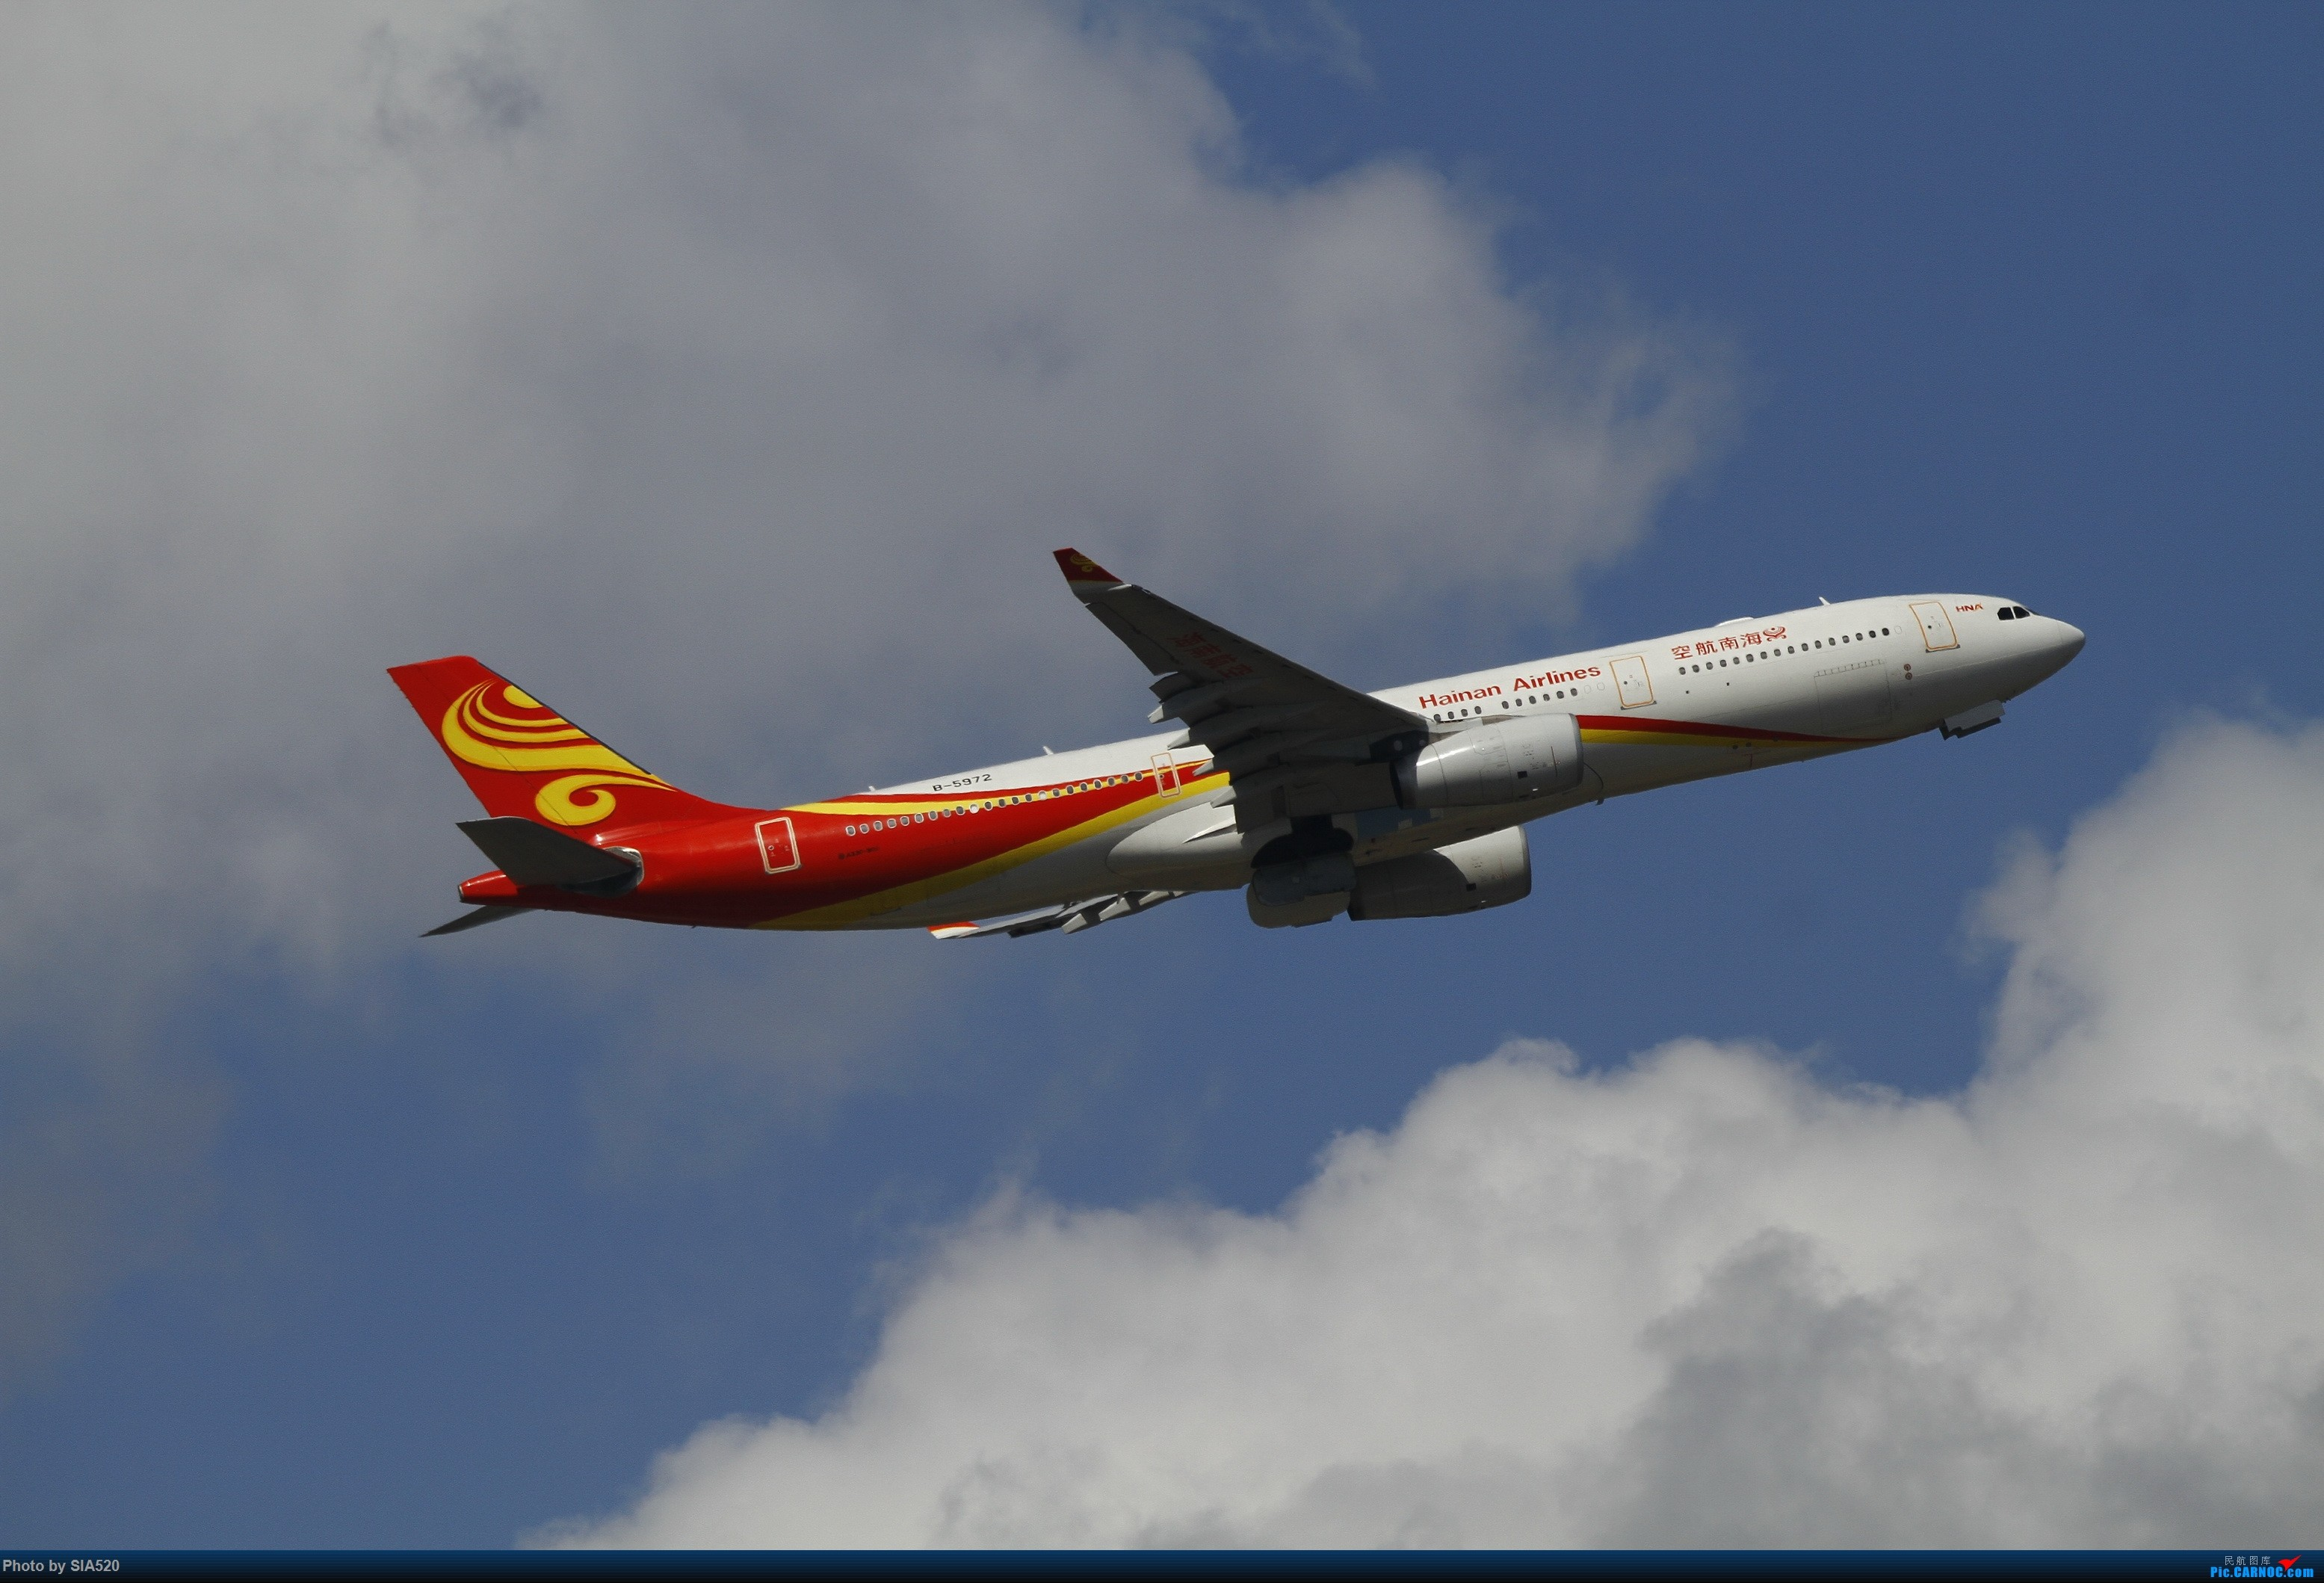 Re:[原创]北京人儿在三亚—600mm解锁凤凰 AIRBUS A330-300 B-5972 中国三亚凤凰国际机场